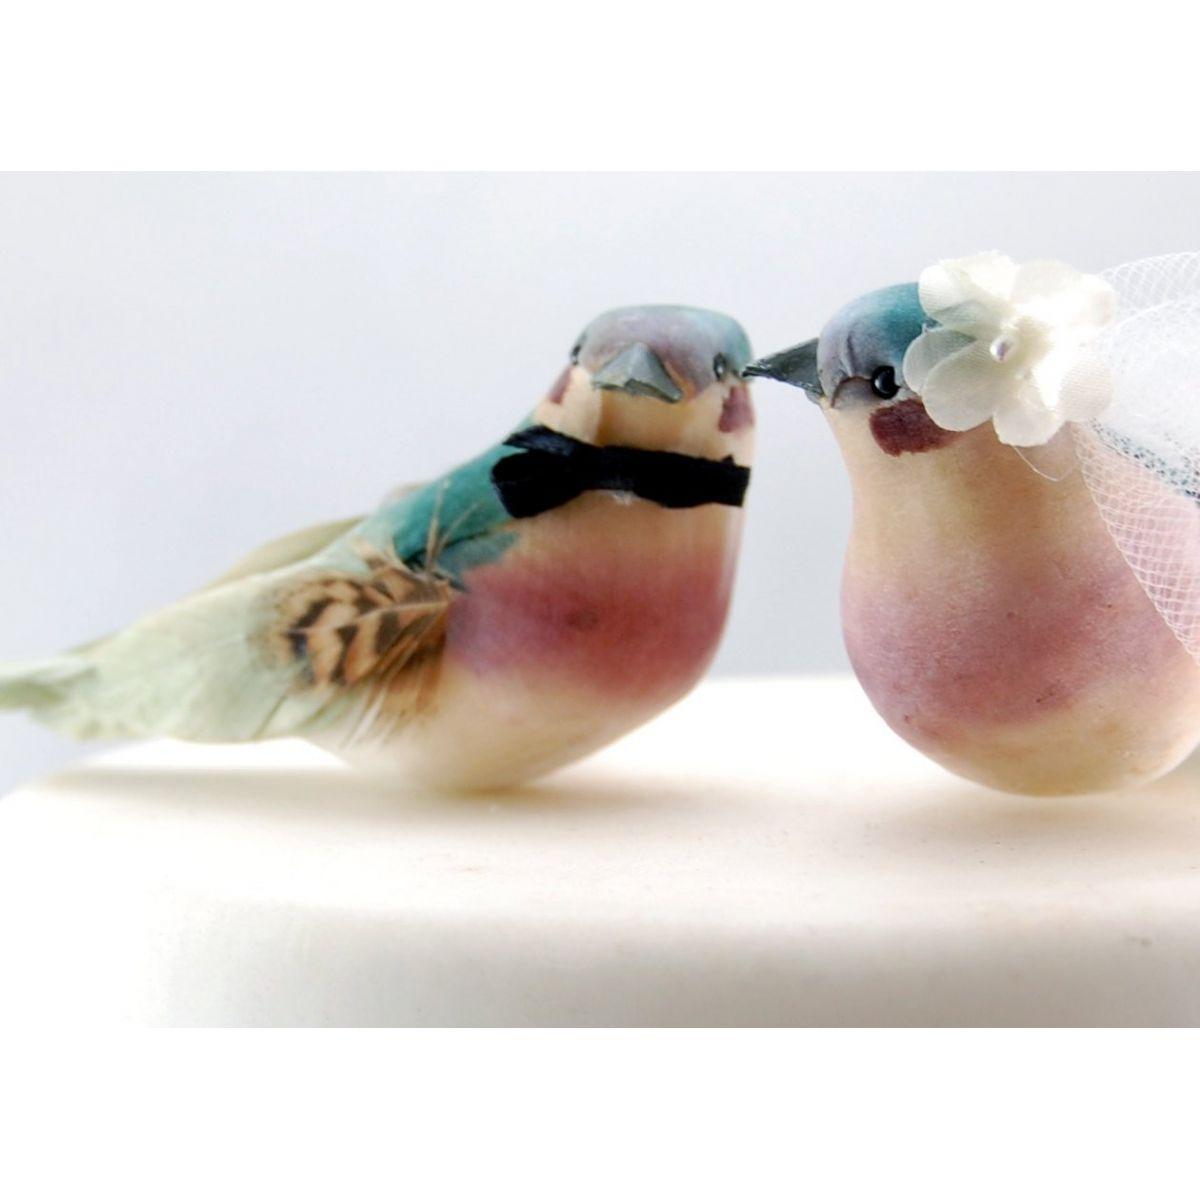 Topo para Bolo - Passarinhos Coloridos